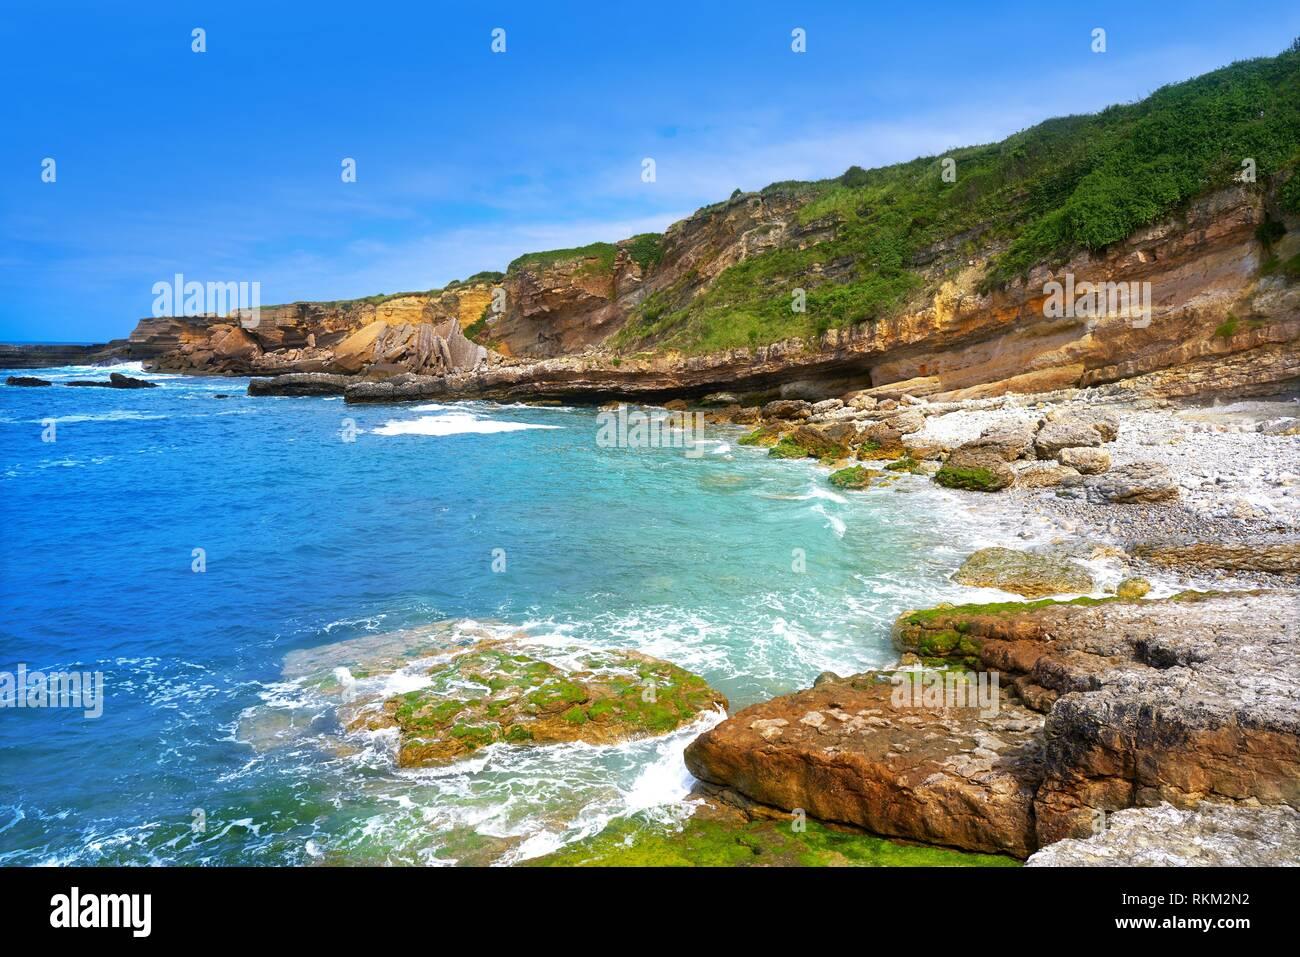 Antromero beach of Cristales with glass stones in Asturias of Spain. - Stock Image